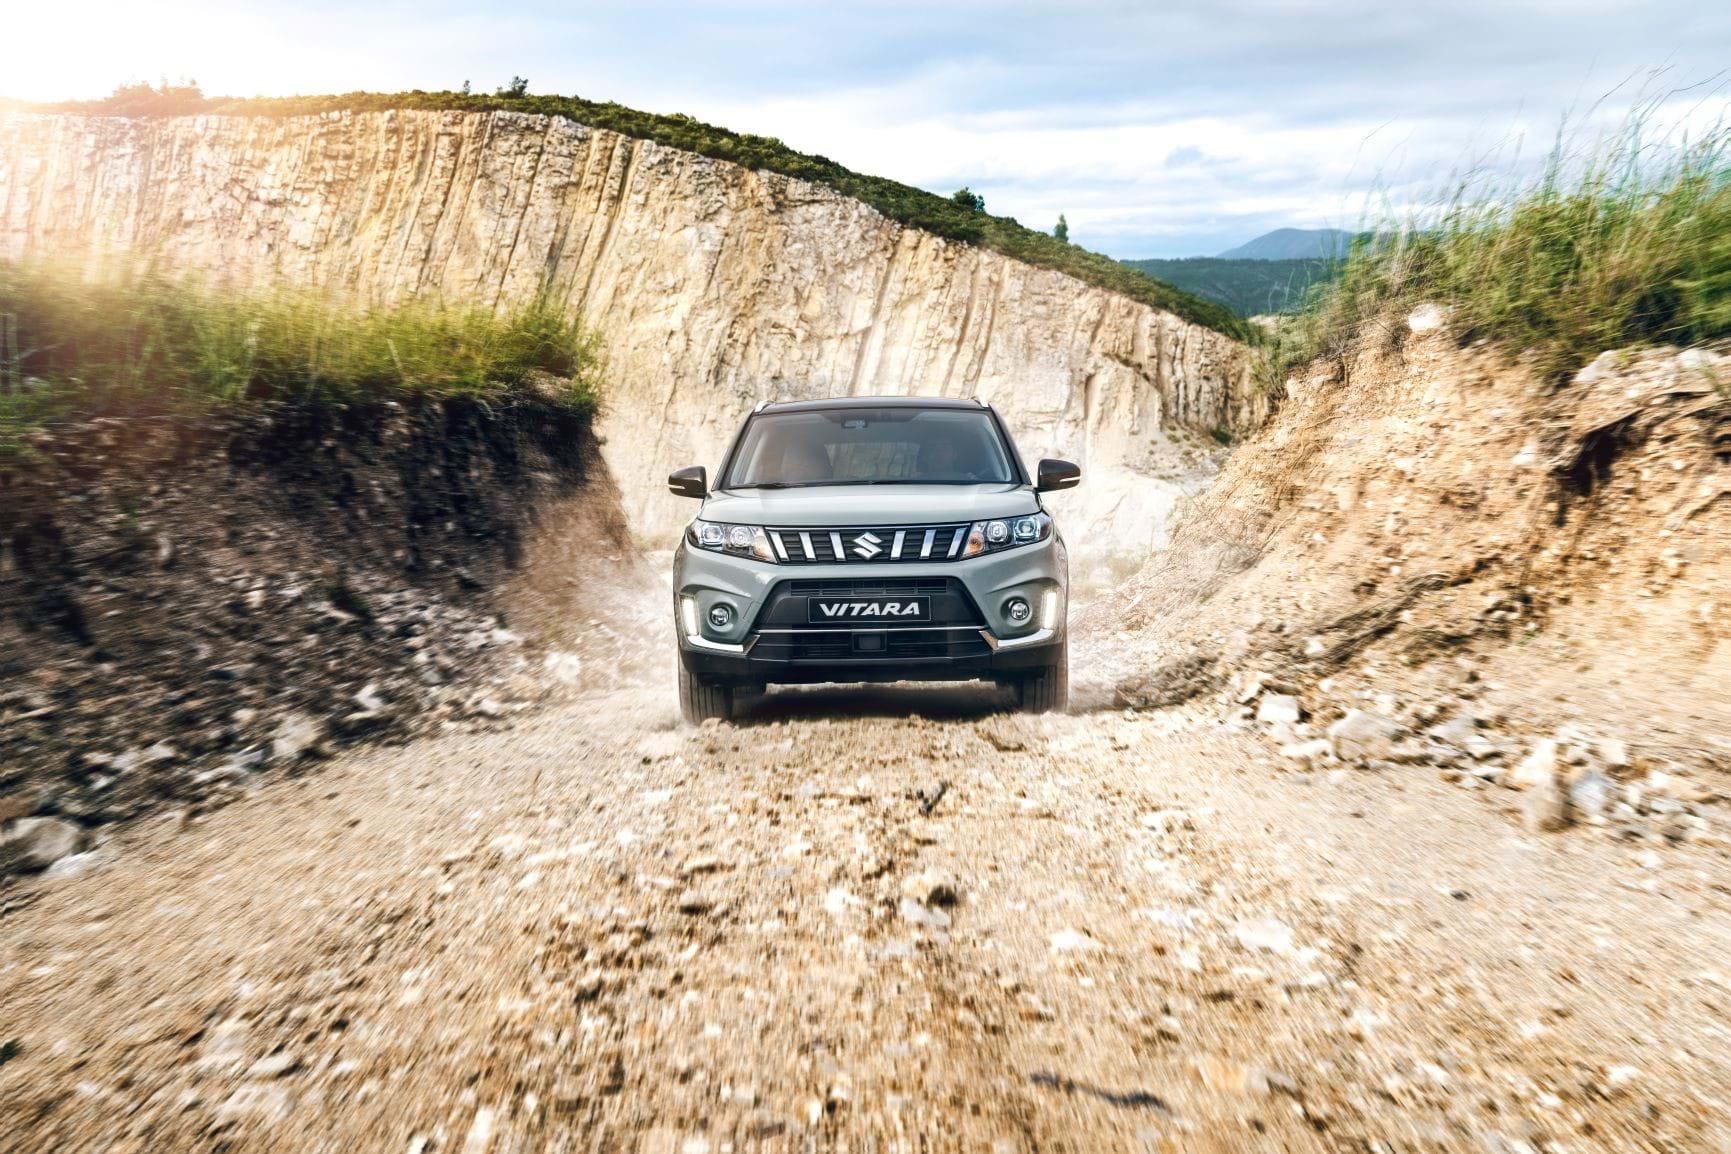 The Vitara driving down a rocky road